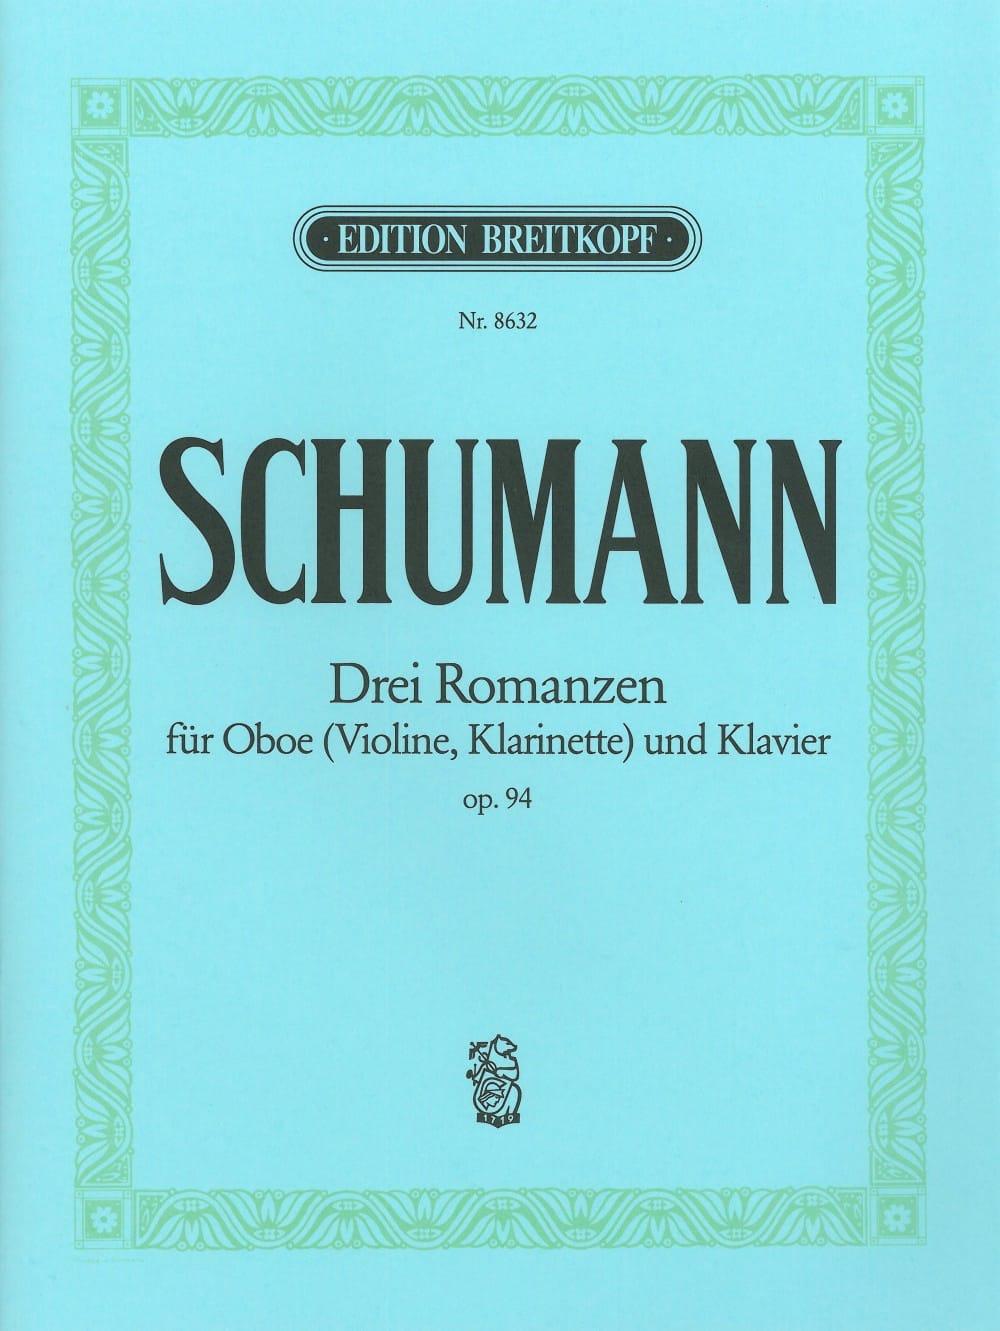 SCHUMANN - 3 Romanzen op. 94 -Oboe Violine, Klarinet Klavier - Partition - di-arezzo.fr